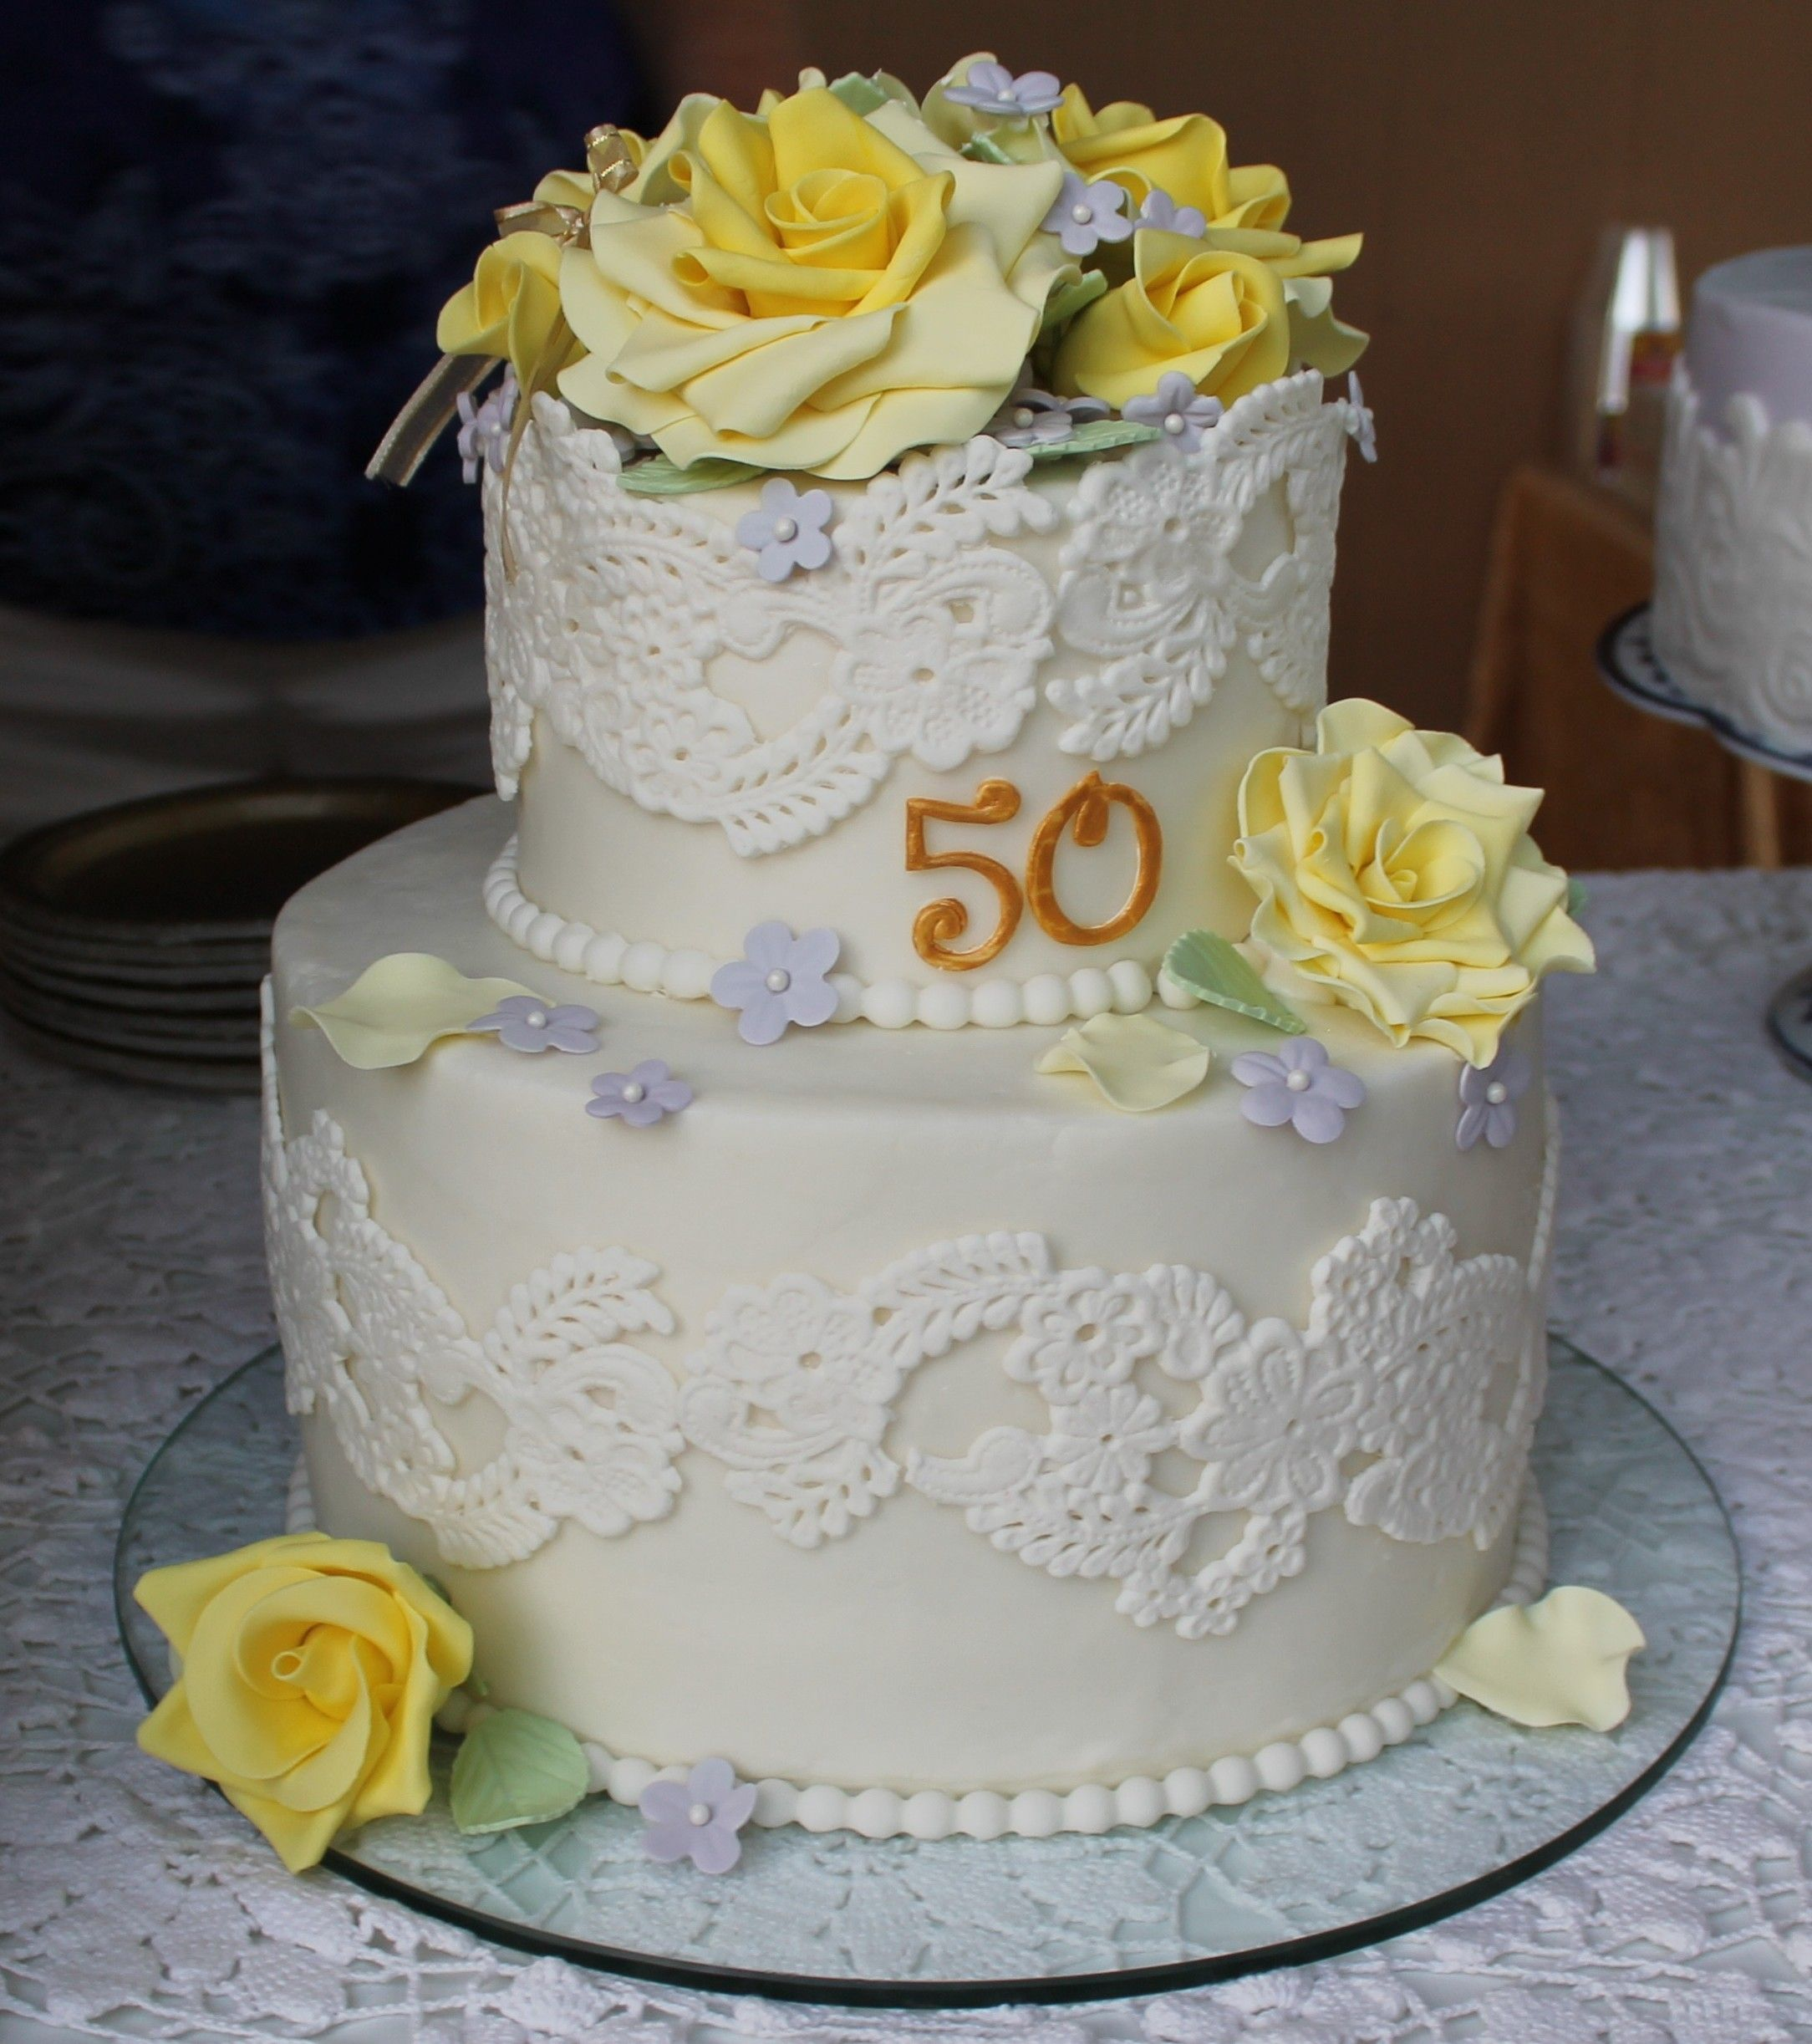 Anniversary+-+CREATOR:+gd-jpeg+v1.0+(using+IJG+JPEG+v62),+quality+=+90